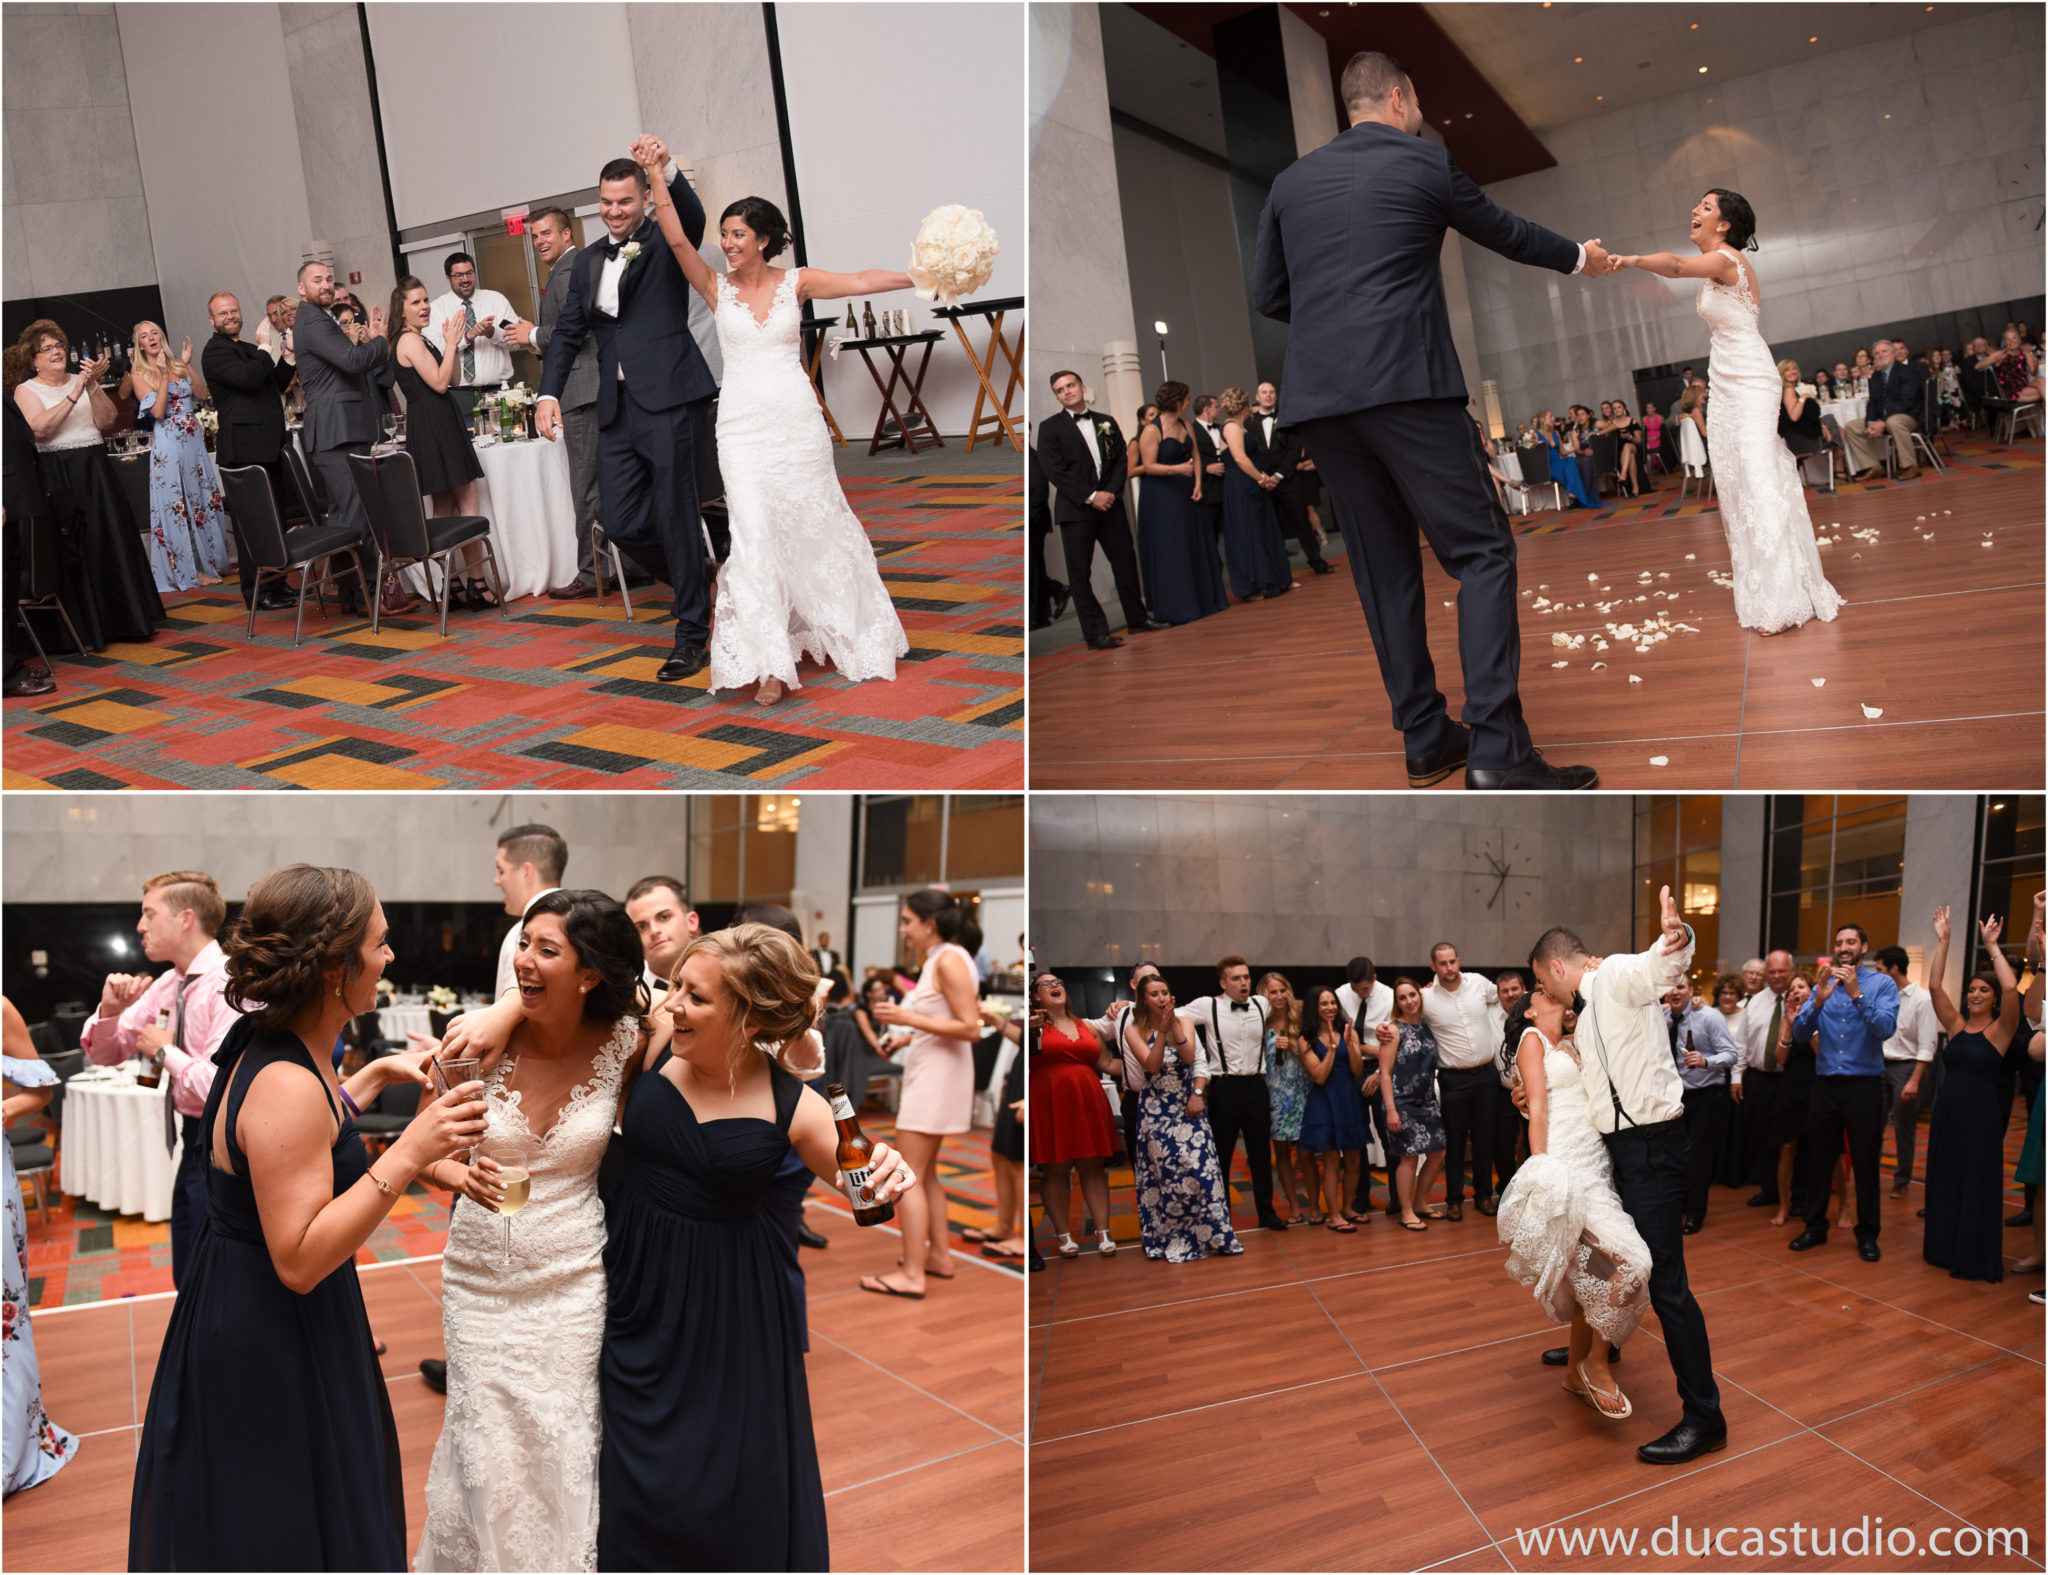 Loews Hotel Philadelphia Wedding Maria Ethan Duca Studio And I Met Many Years Ago At